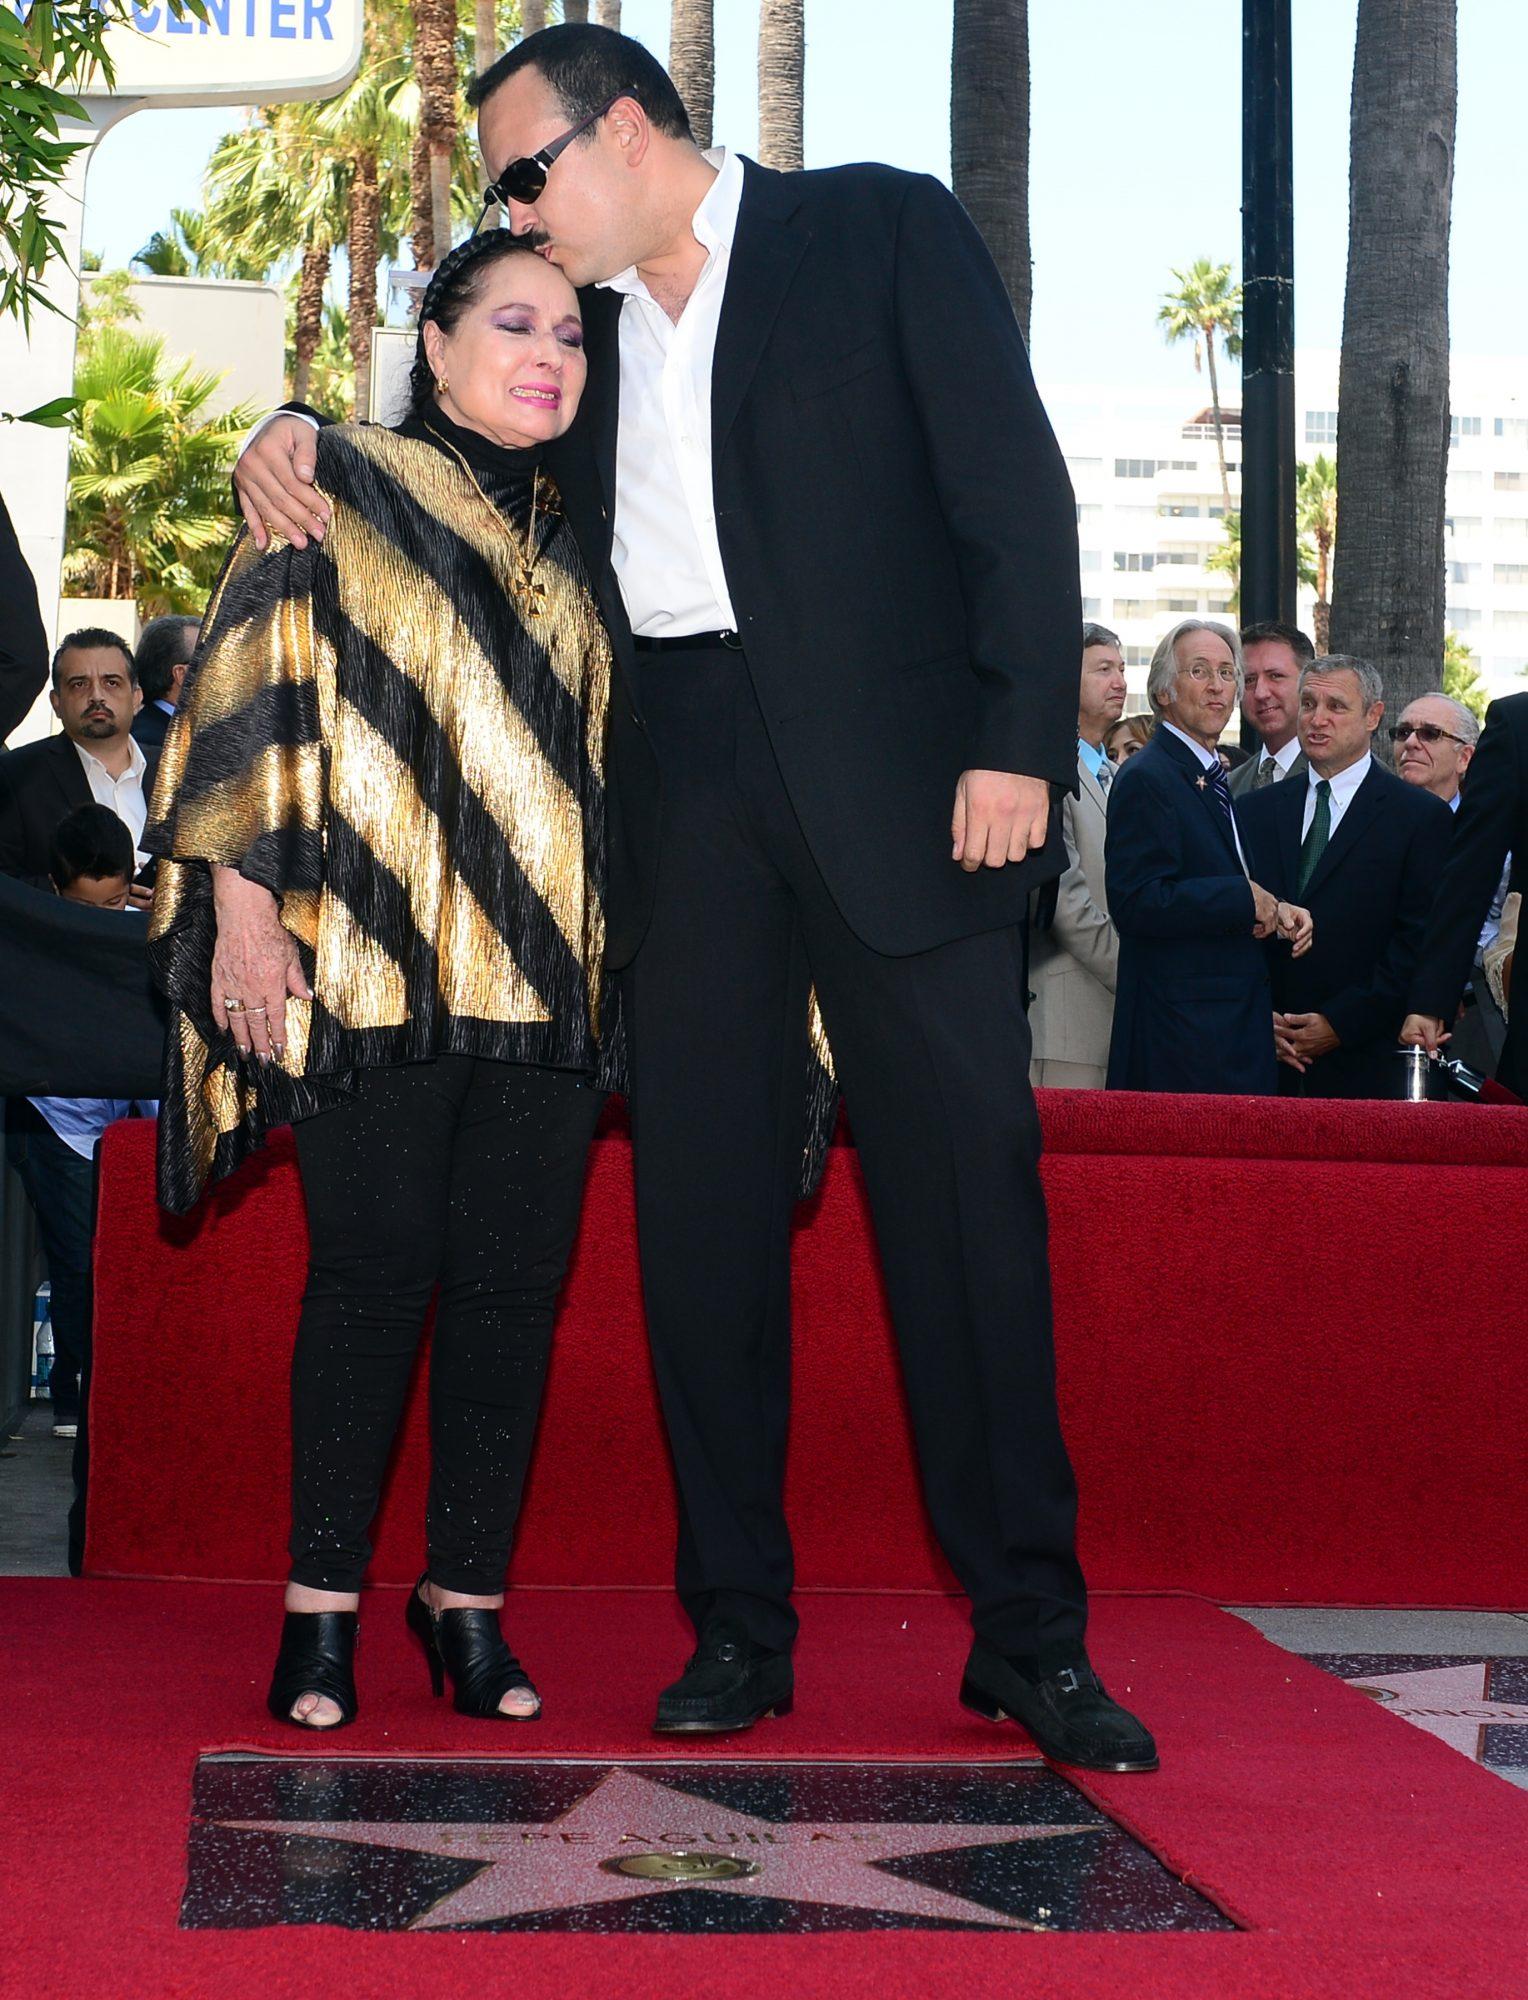 Pepe Aguilar y su mamá Flor Silvestre